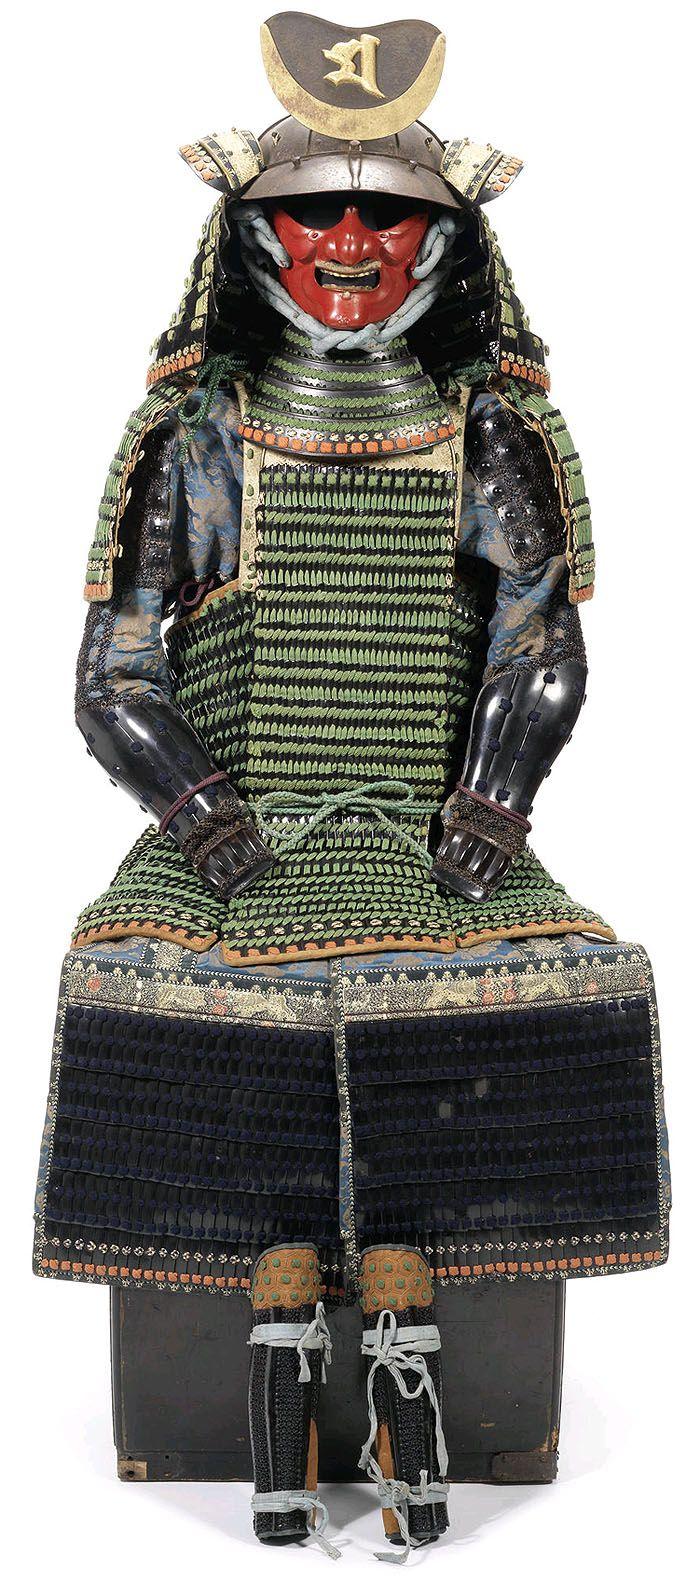 Semaki Kabuto - Hime Yoroi (princess armour)  Late Edo Period, 19th